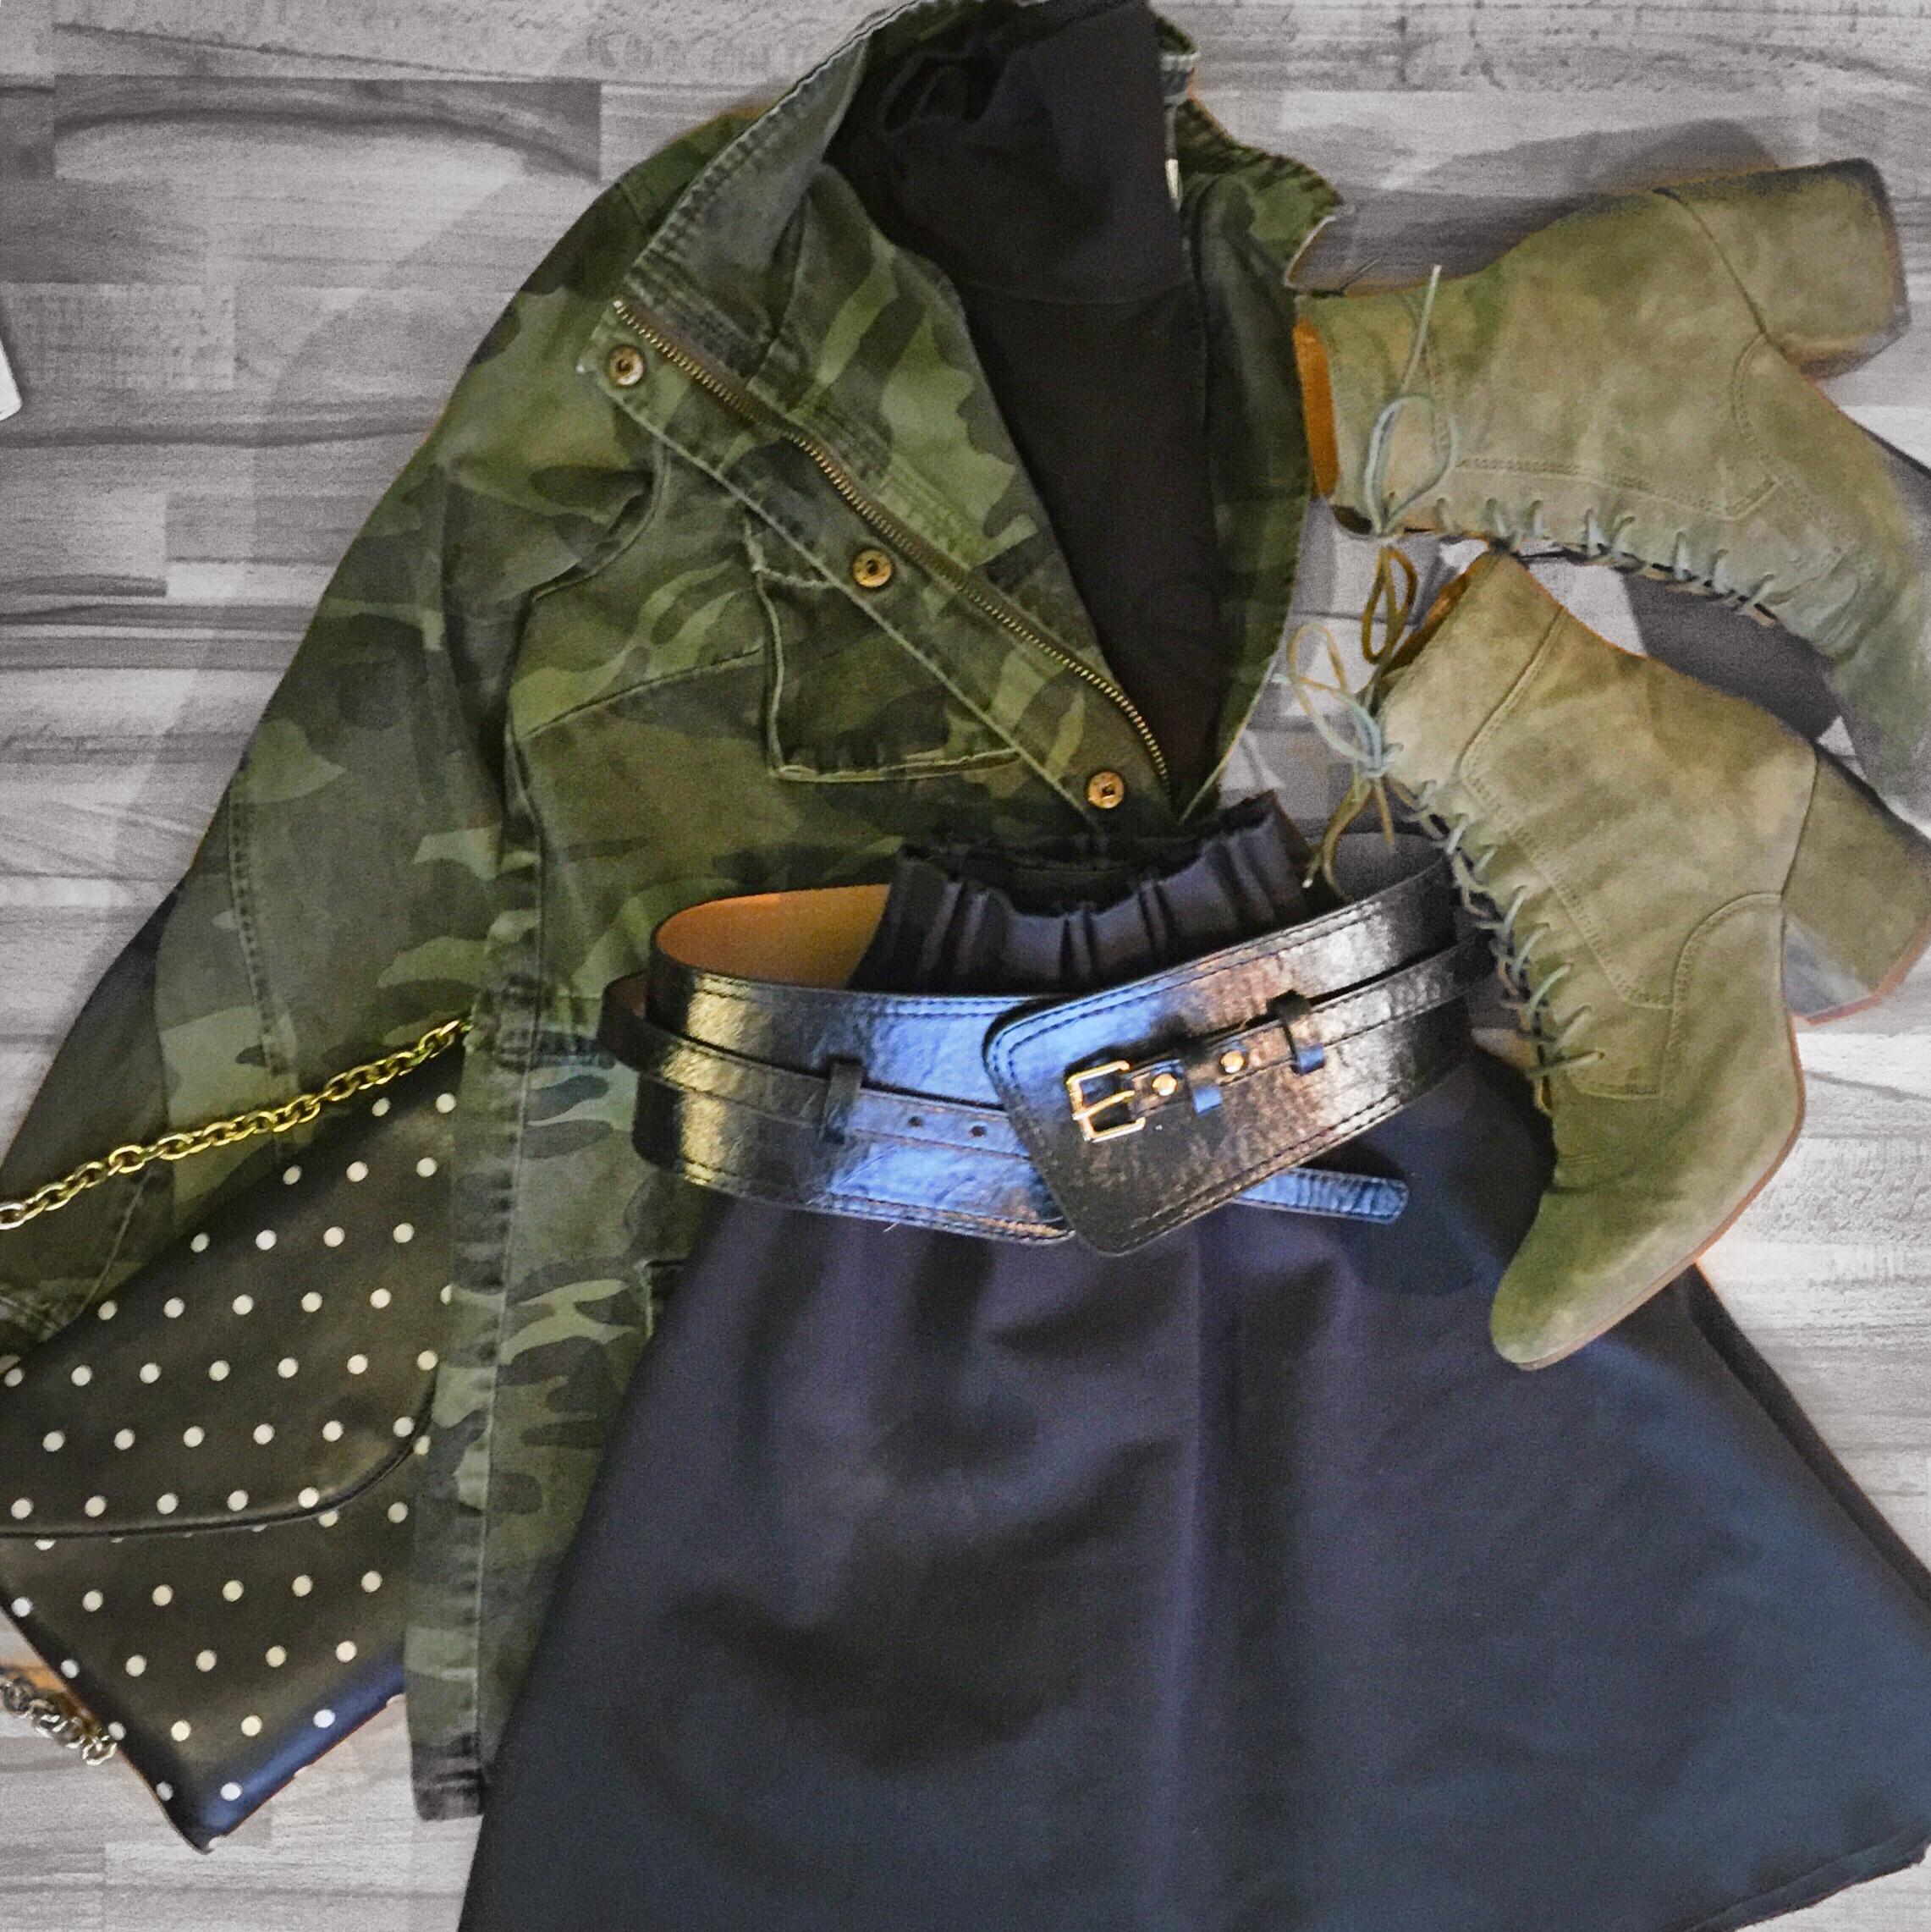 Camo jacket ( Stitch Fix ), Black turtleneck ( Uniqlo ), Corset belt ( Asos ), Green skirt (Zara - similar  here and  here ), Green lace-up boots ( Franco Sarto ), Polka-dot purse (J. Crew -  similar here )